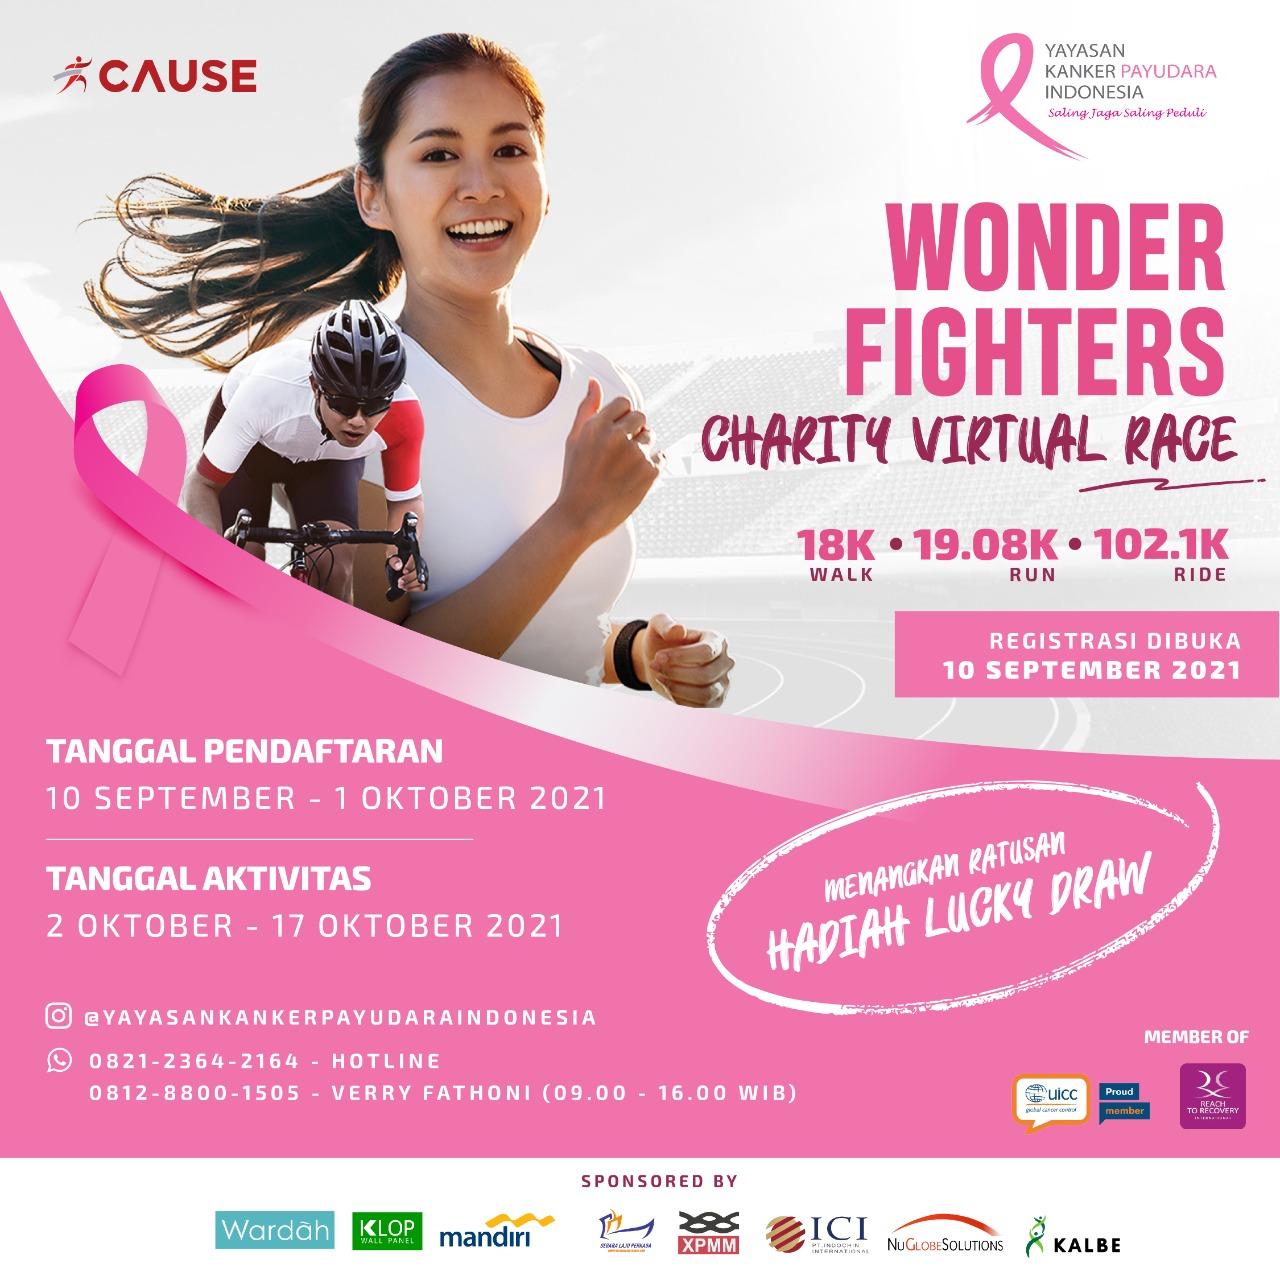 Charity Virtual Race: Wonder Fighters